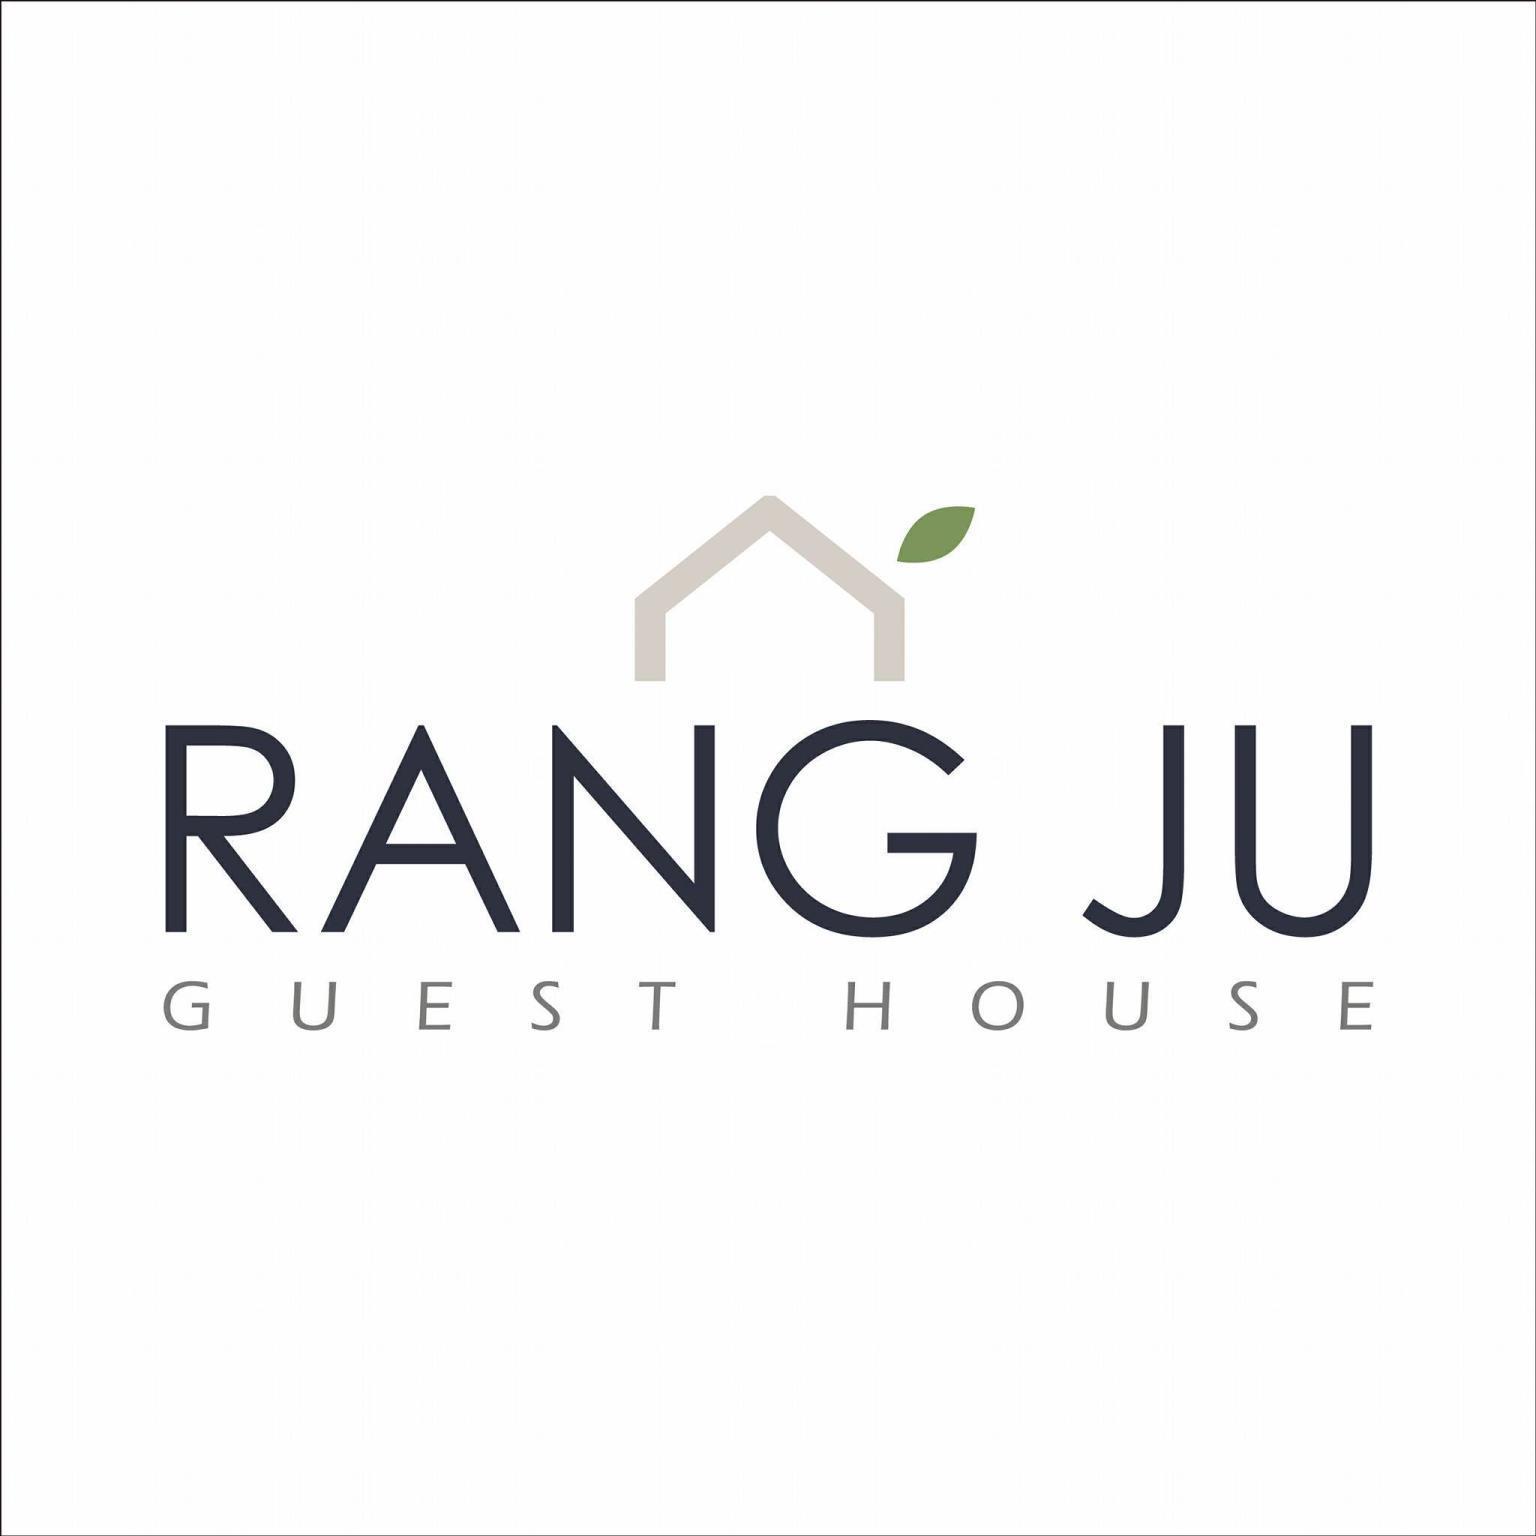 Rang Ju Guest House